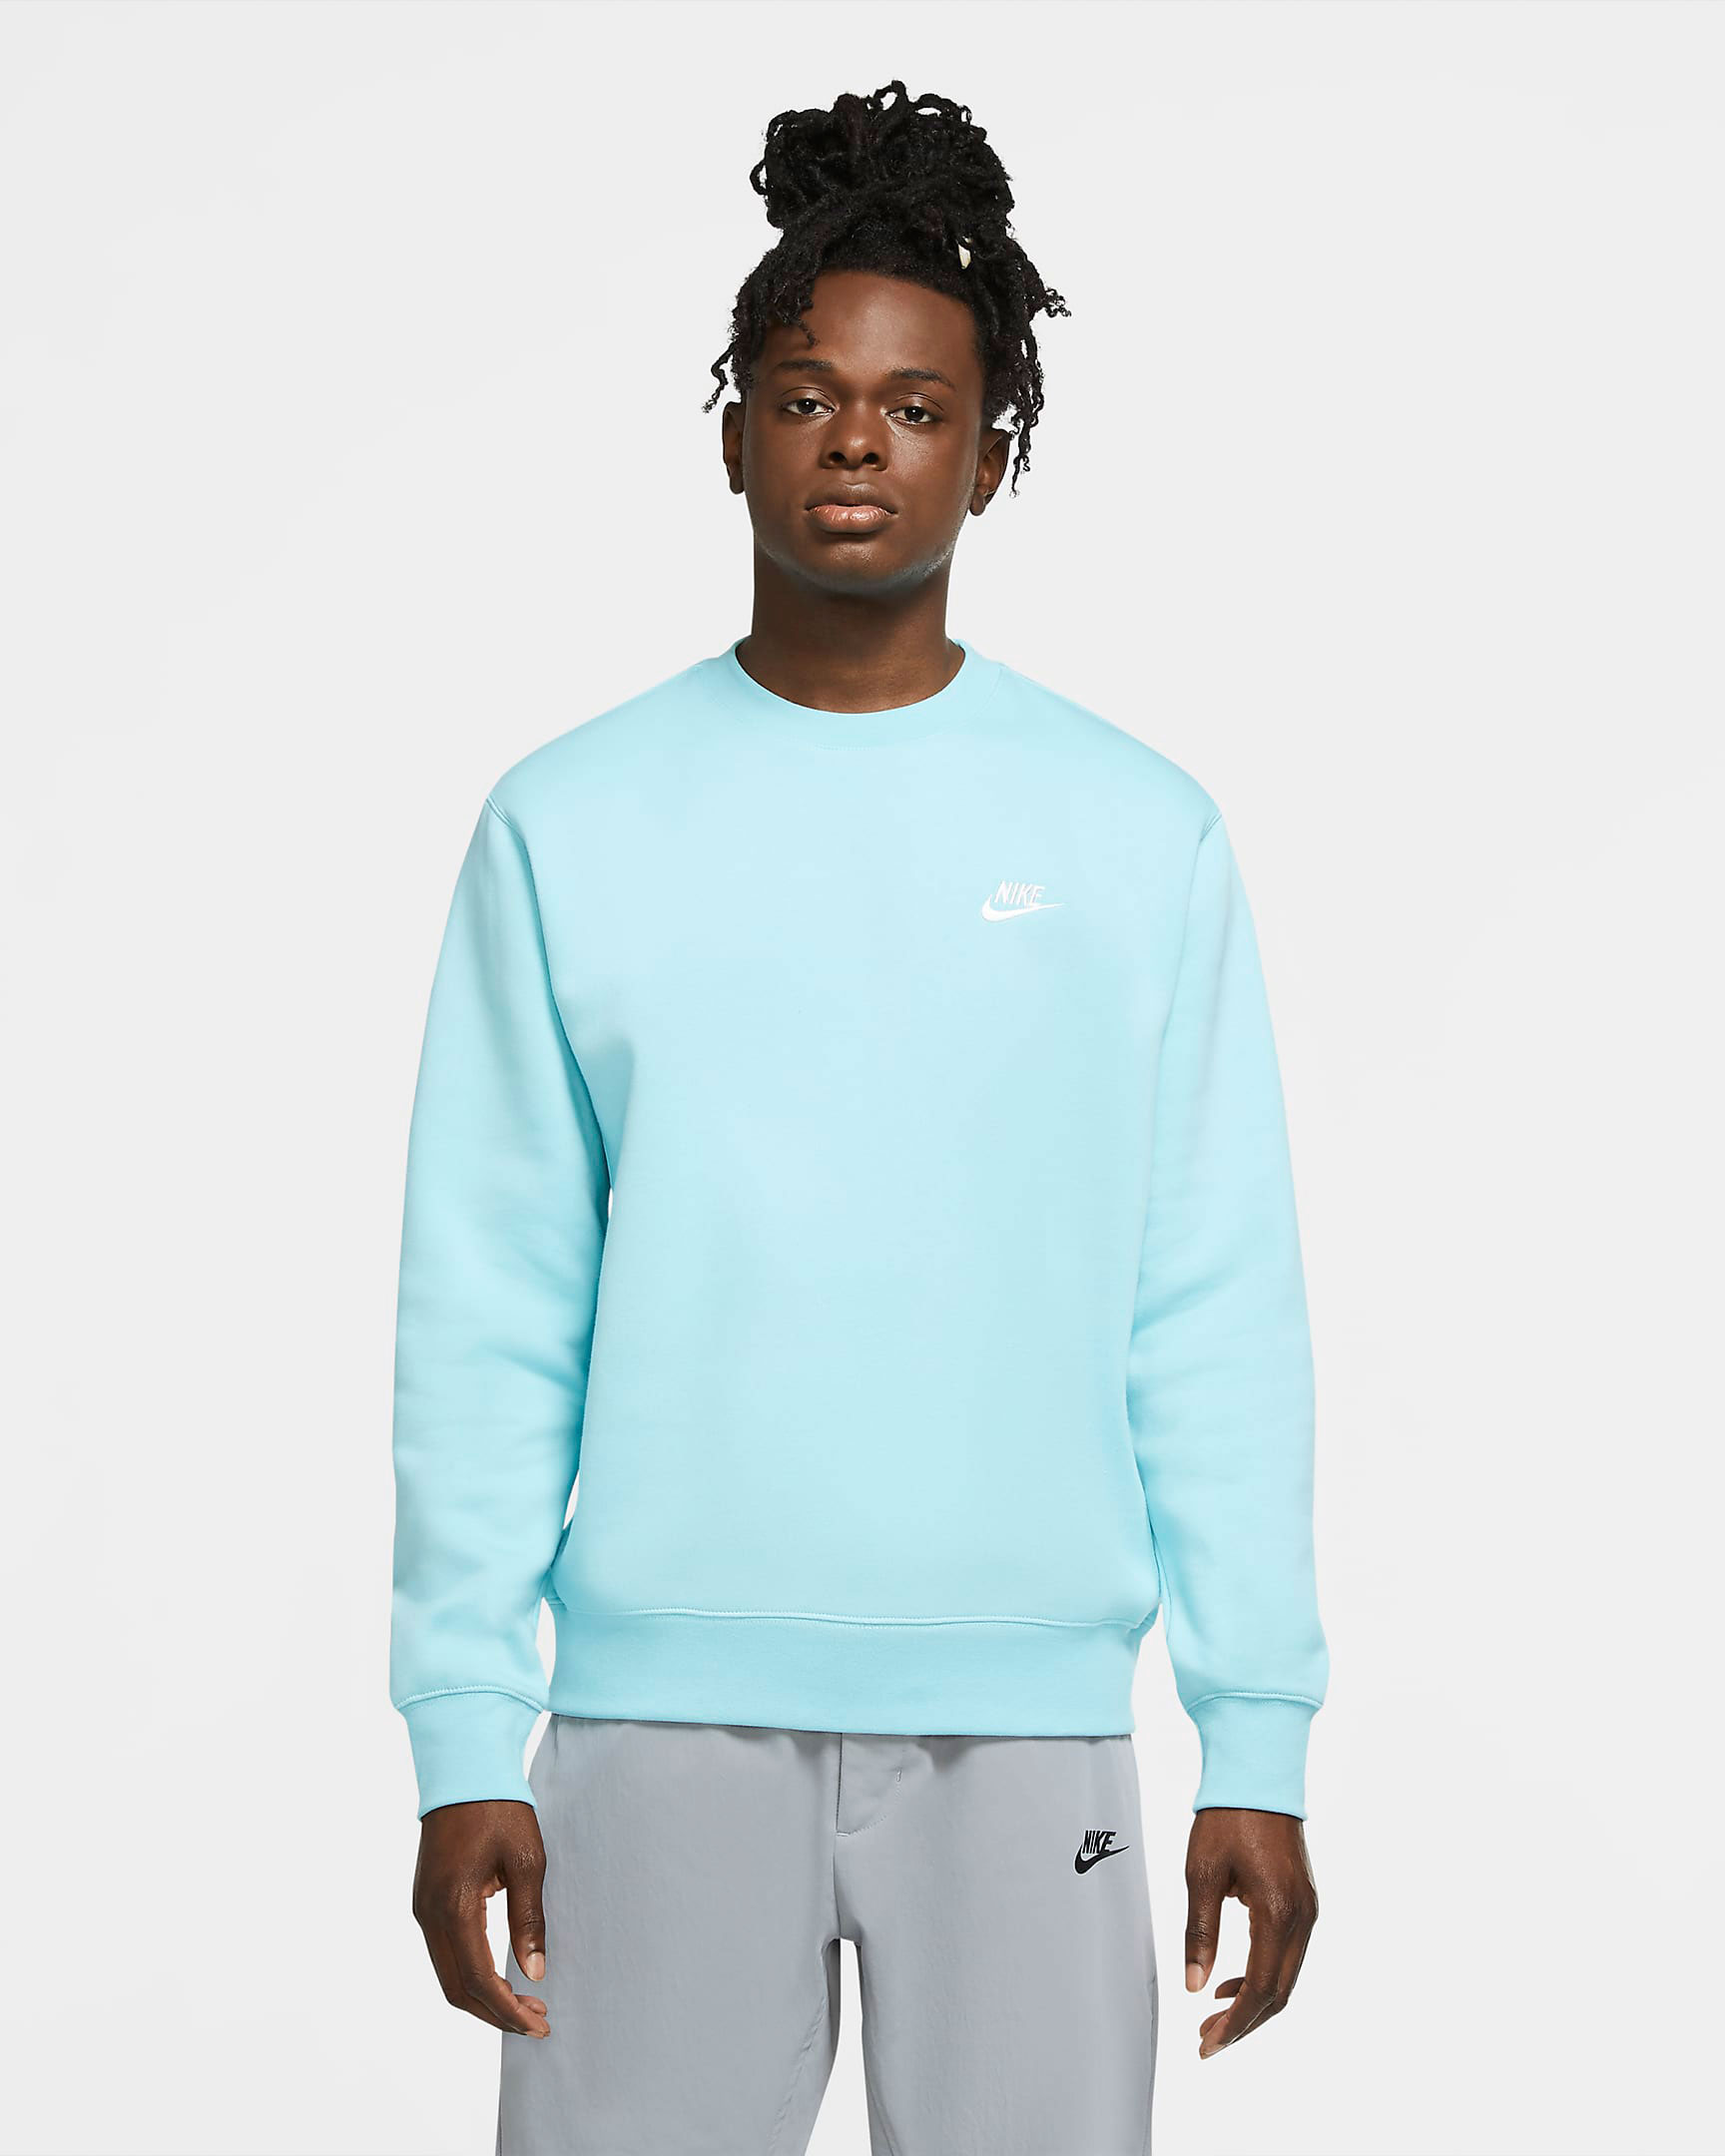 nike-sb-dunk-low-elephant-sweatshirt-1